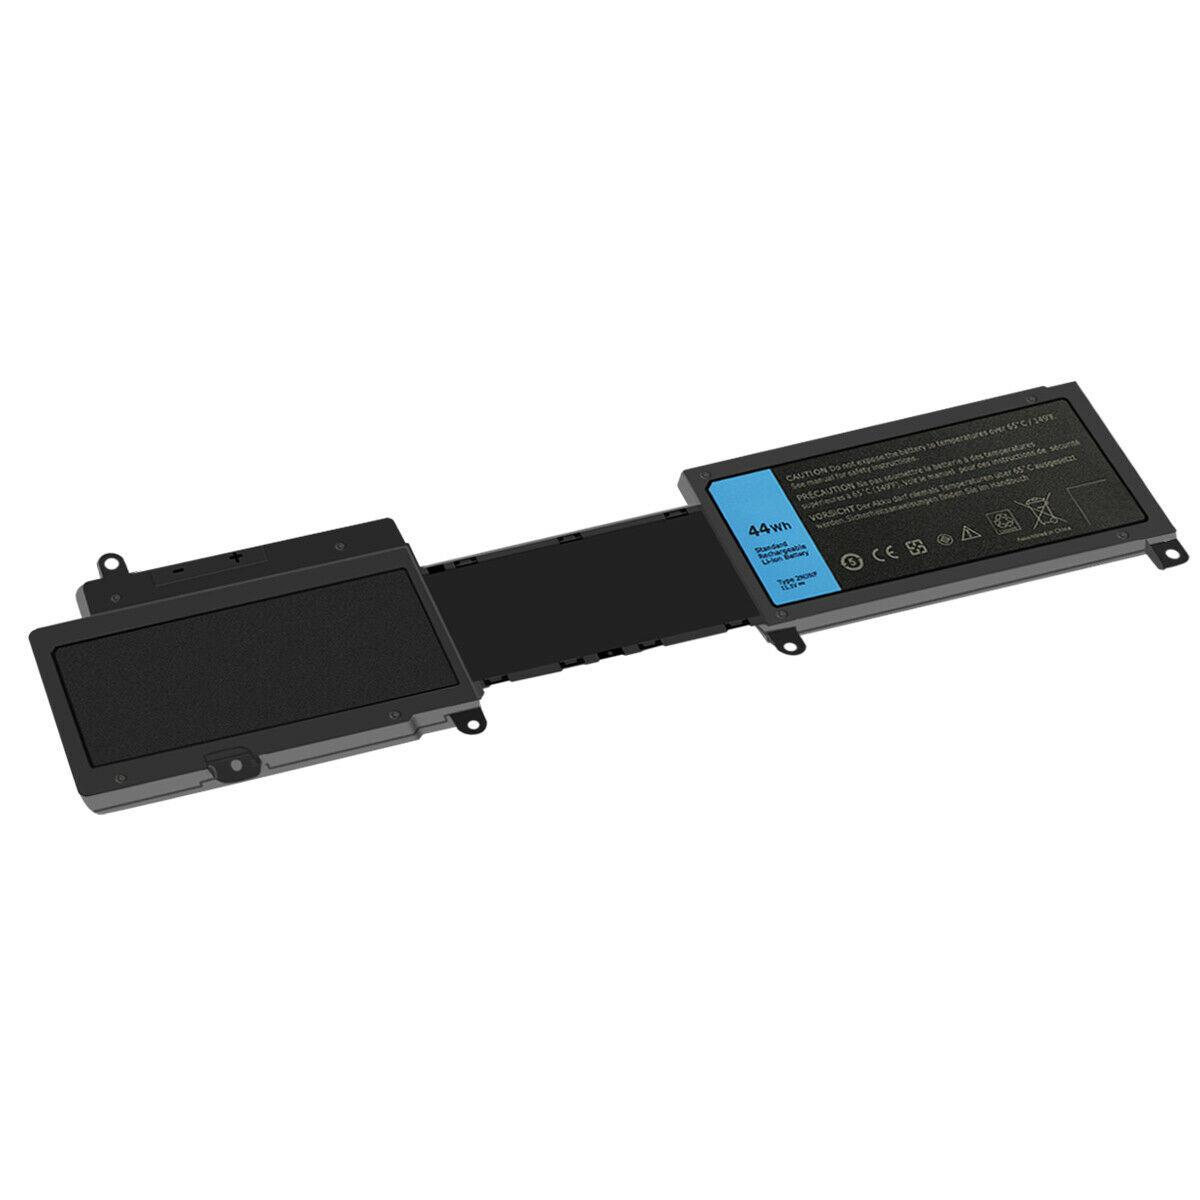 Batteri til Dell 0911MD 0TPMCF 2NJNF 8JVDG 911MD (kompatibelt)